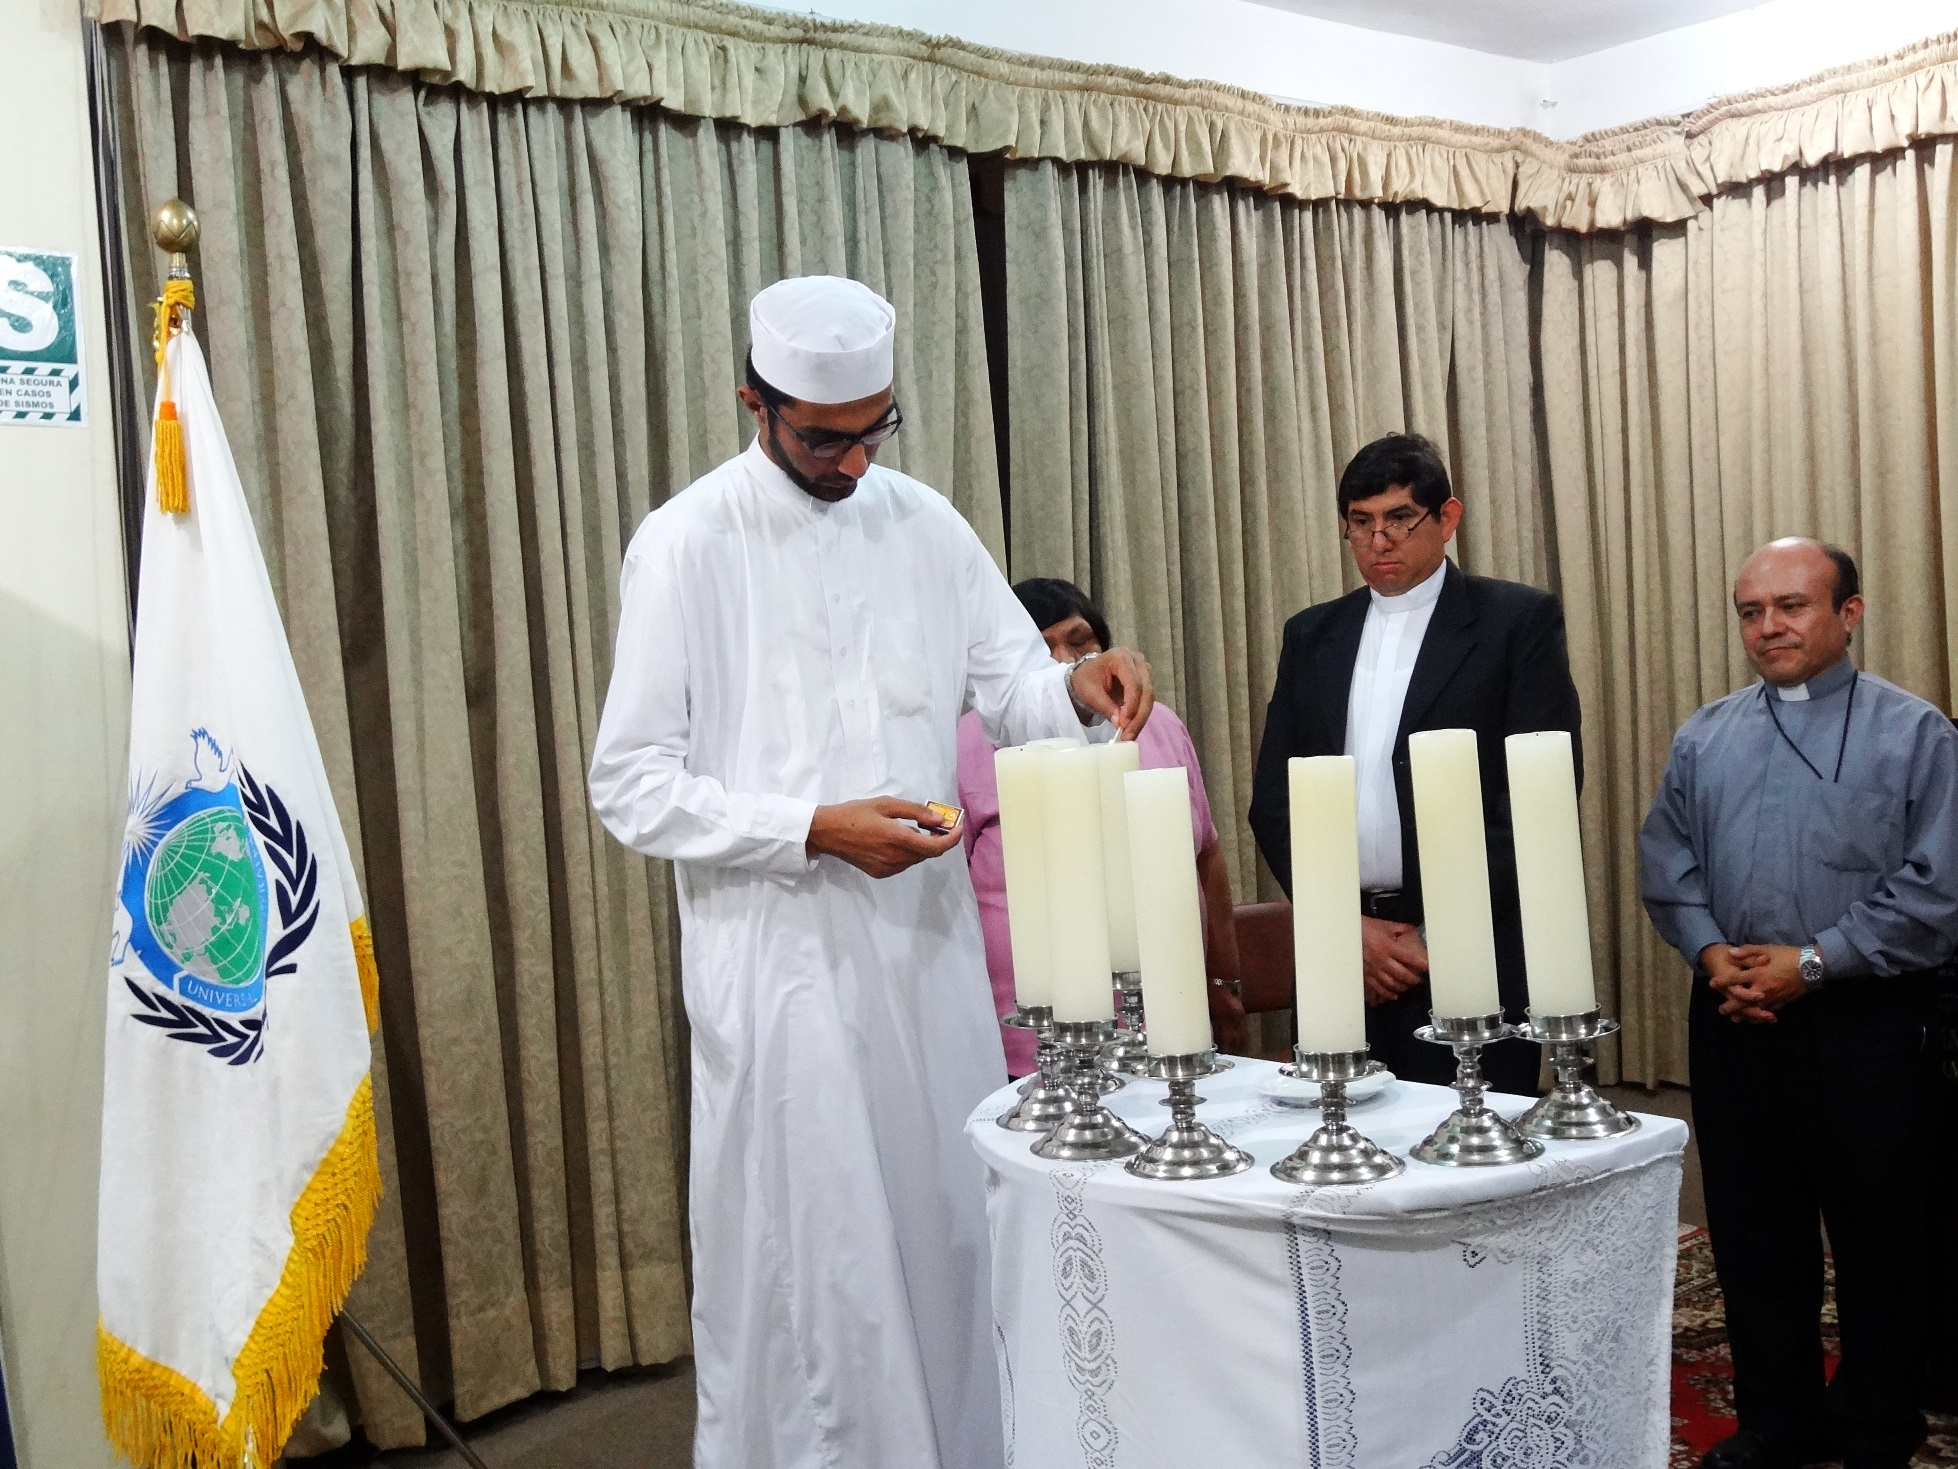 Candle ceremony 1.jpg